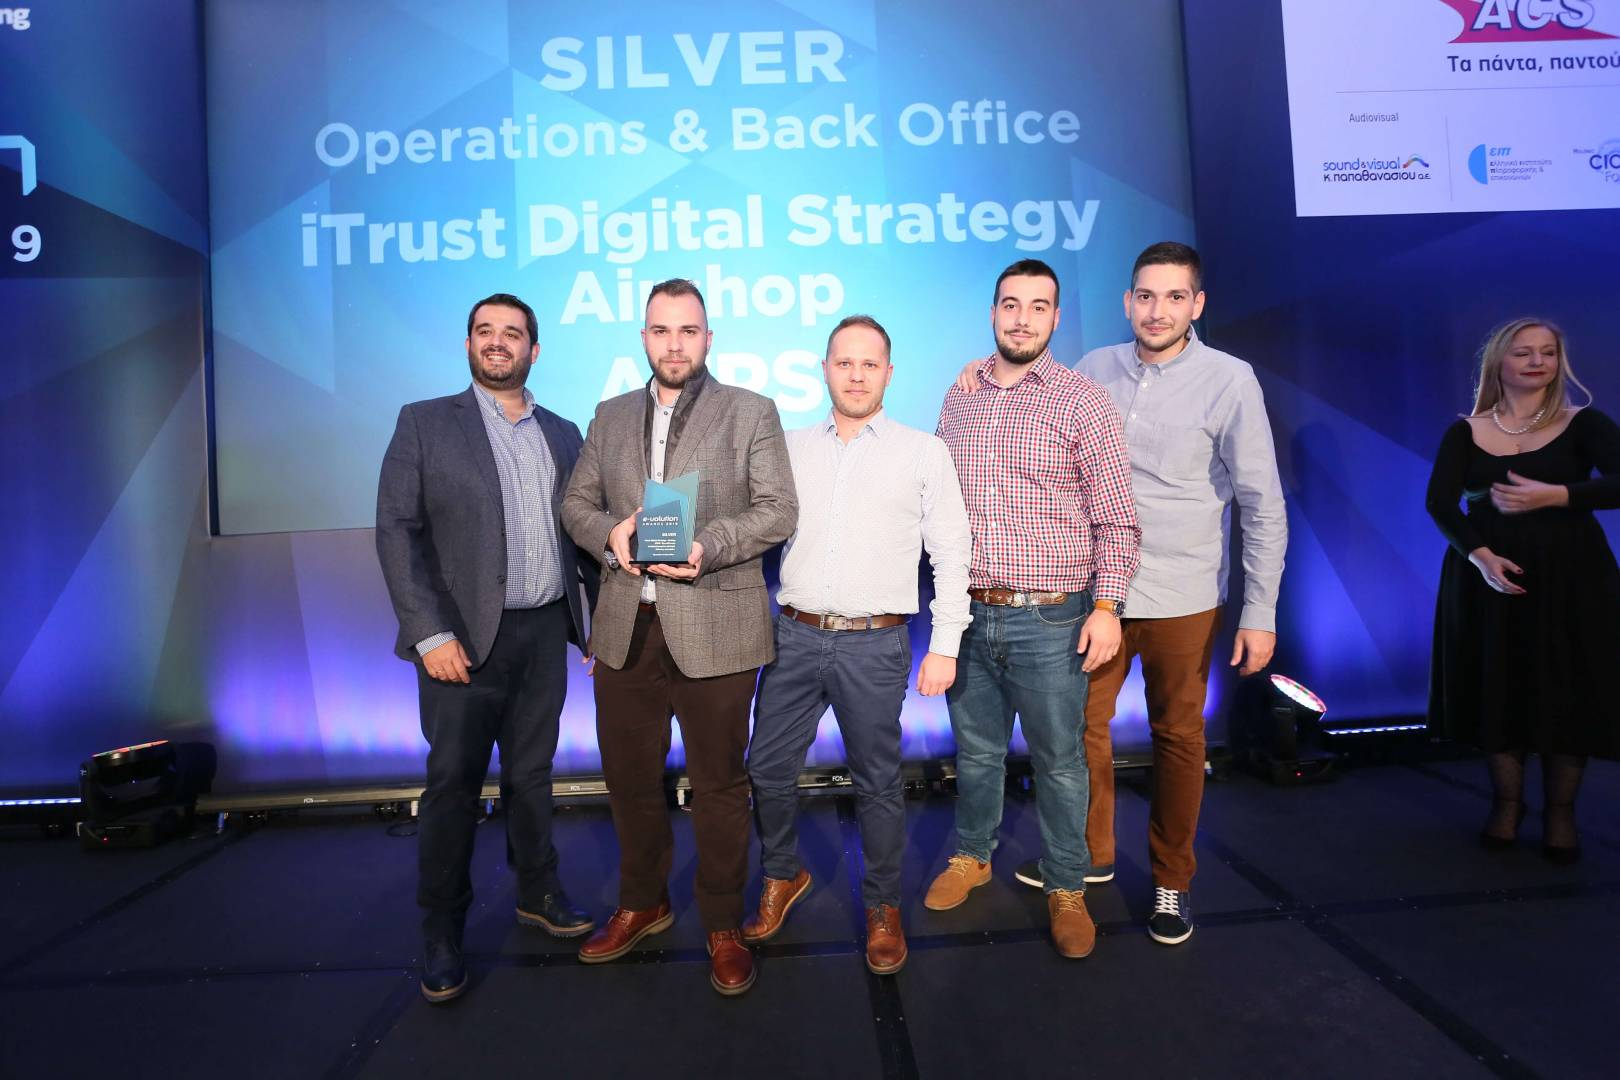 Airshop τεχνολογική καινοτομία βράβευση στα evolution awards 2019